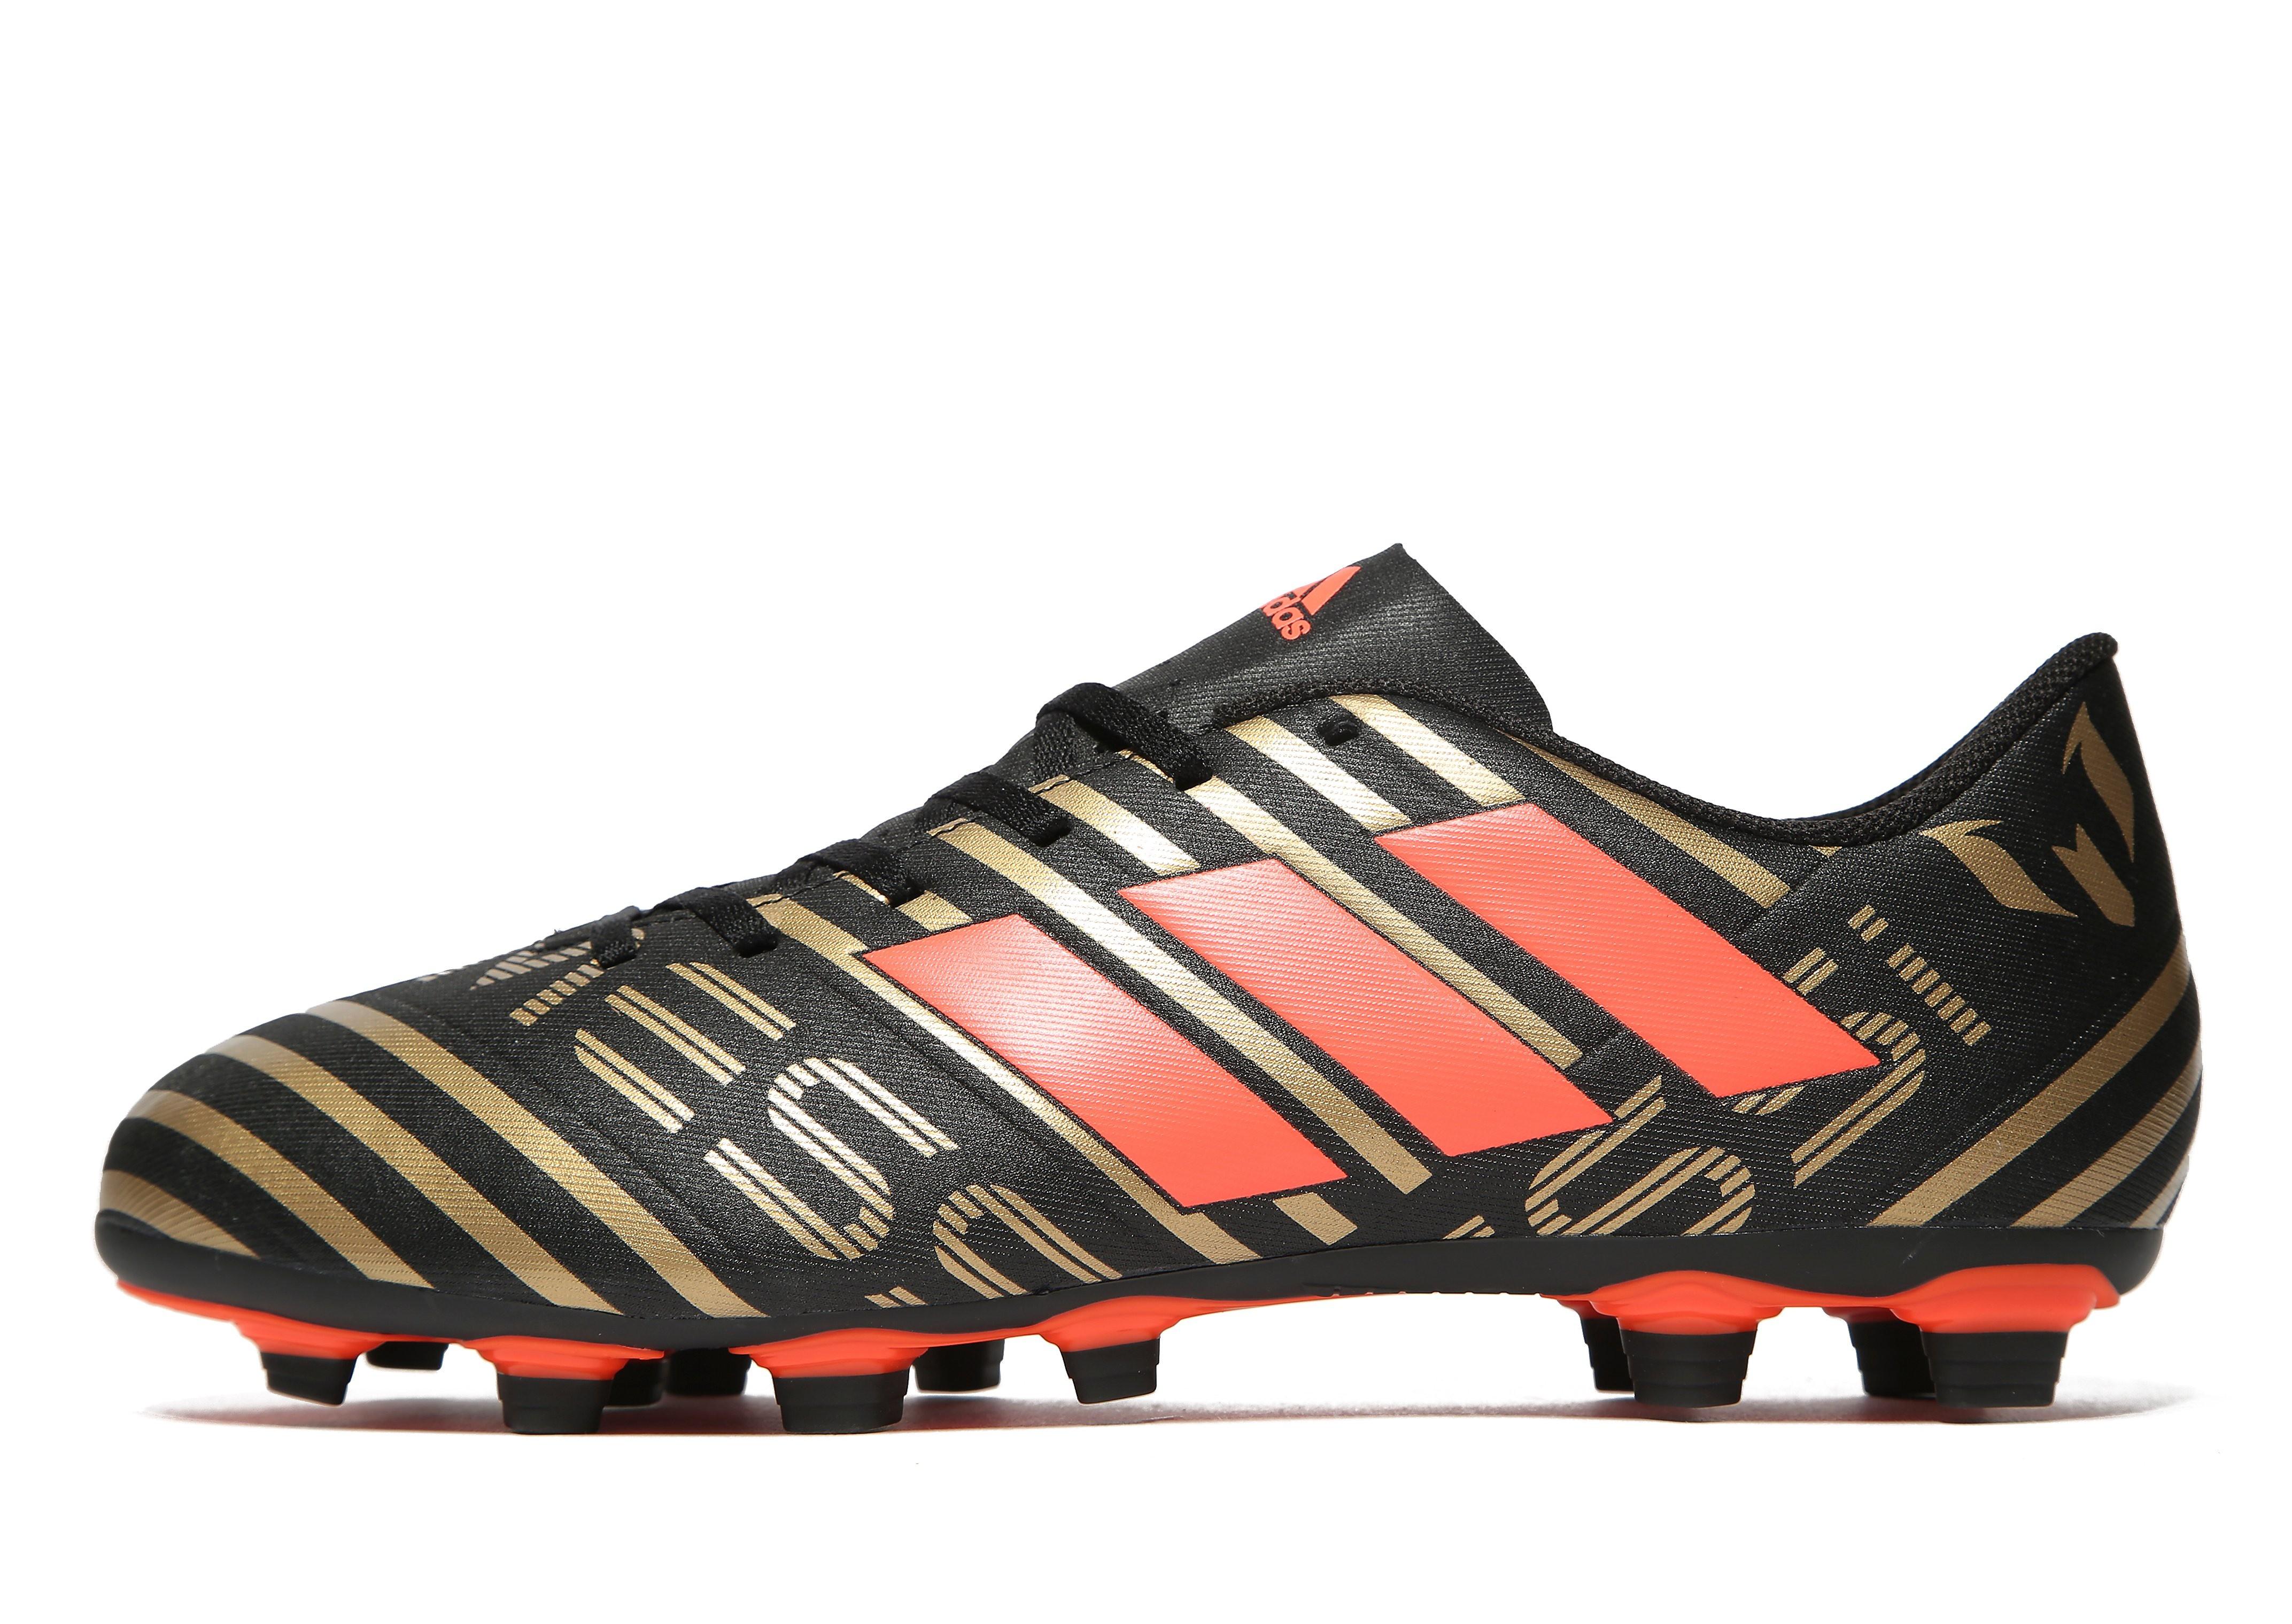 adidas SkyStalker Nemeziz Messi 17.4 FG